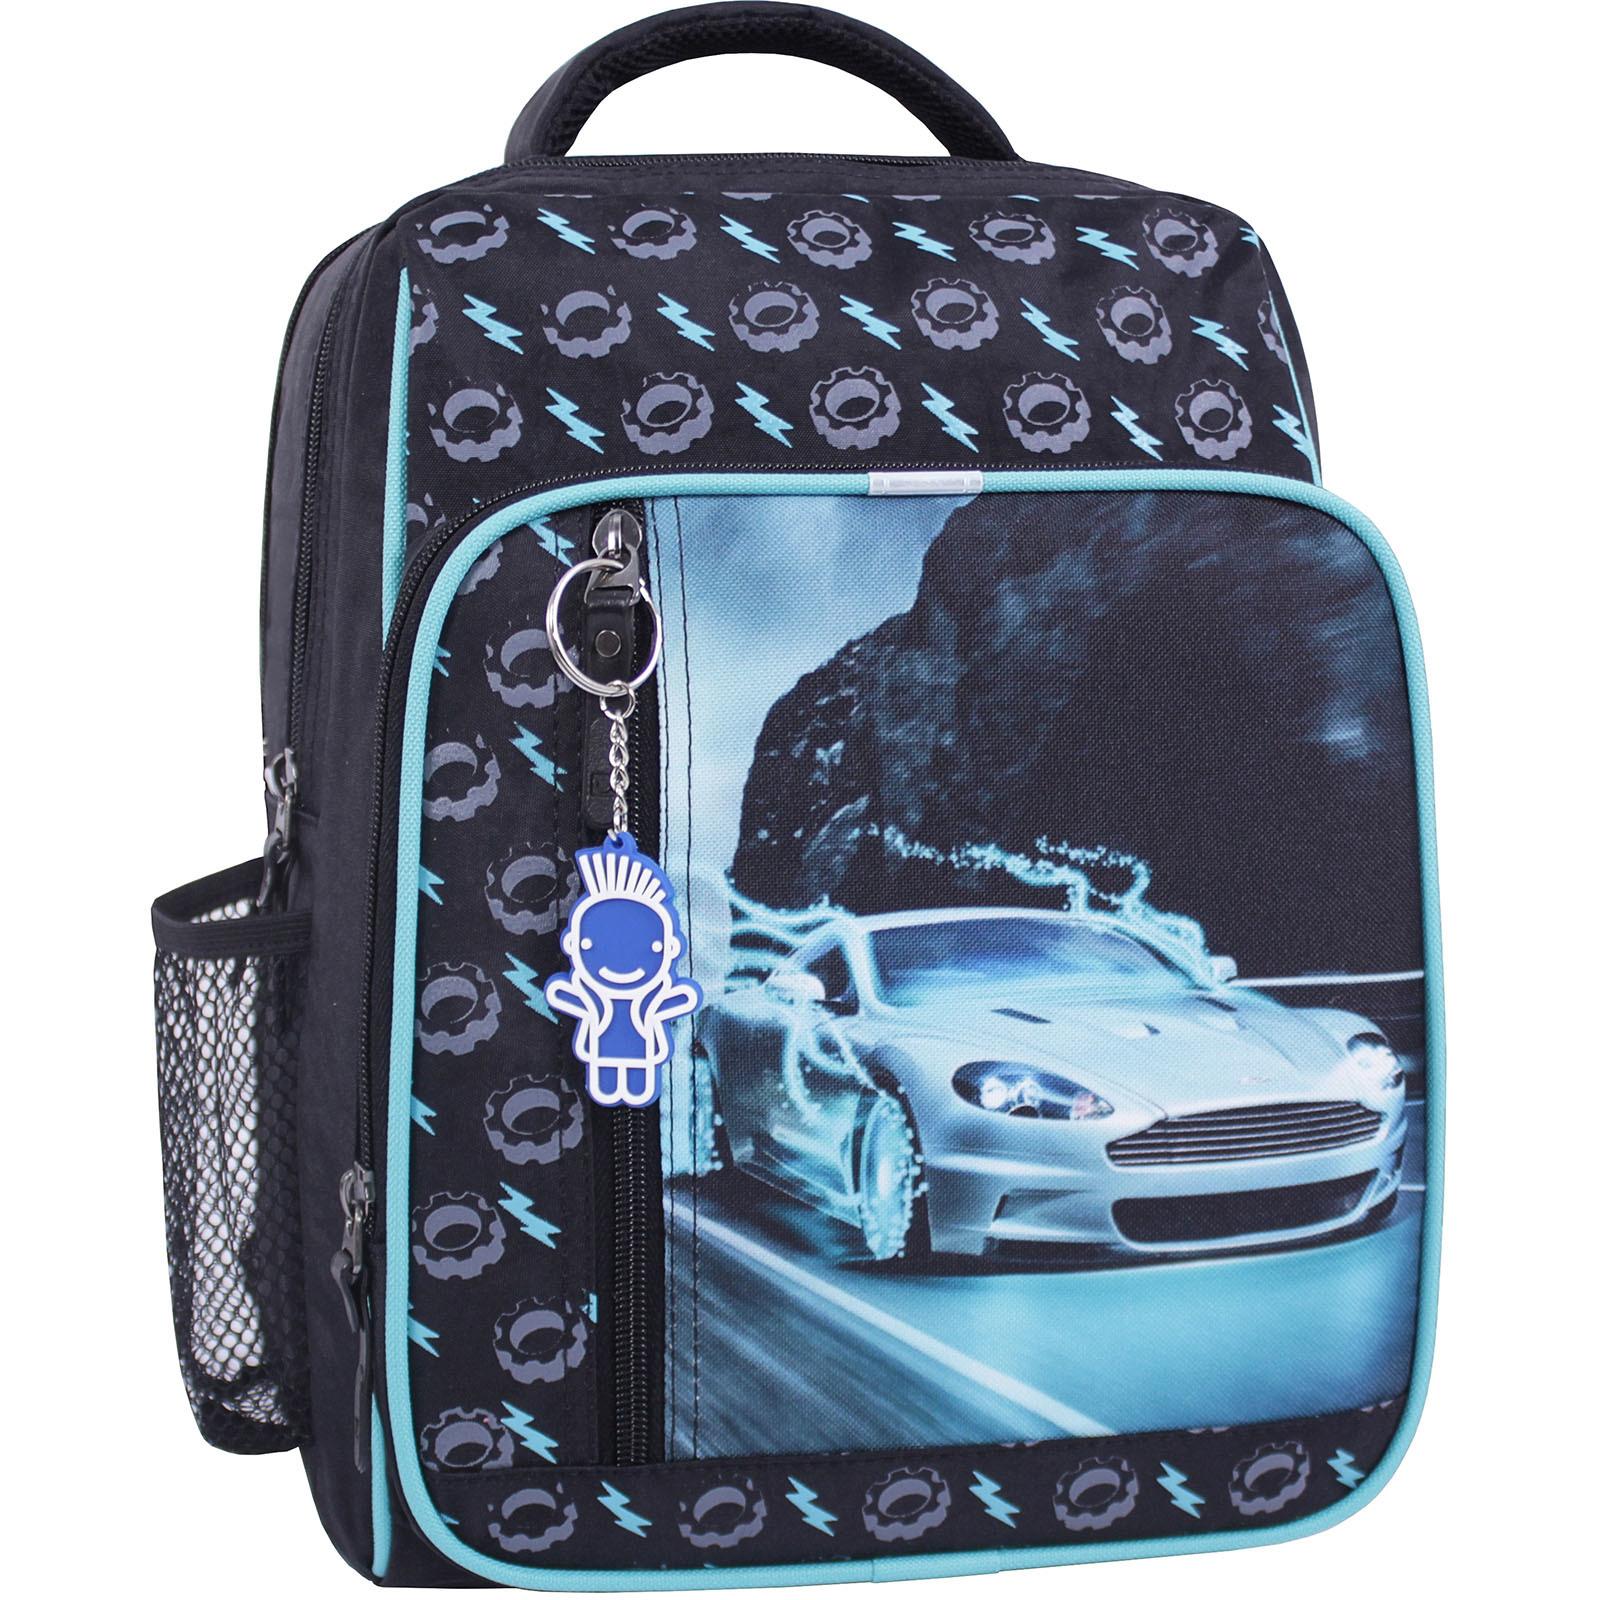 Школьные рюкзаки Рюкзак школьный Bagland Школьник 8 л. 321 черный 558 (00112702) IMG_1560_суб.558_.JPG